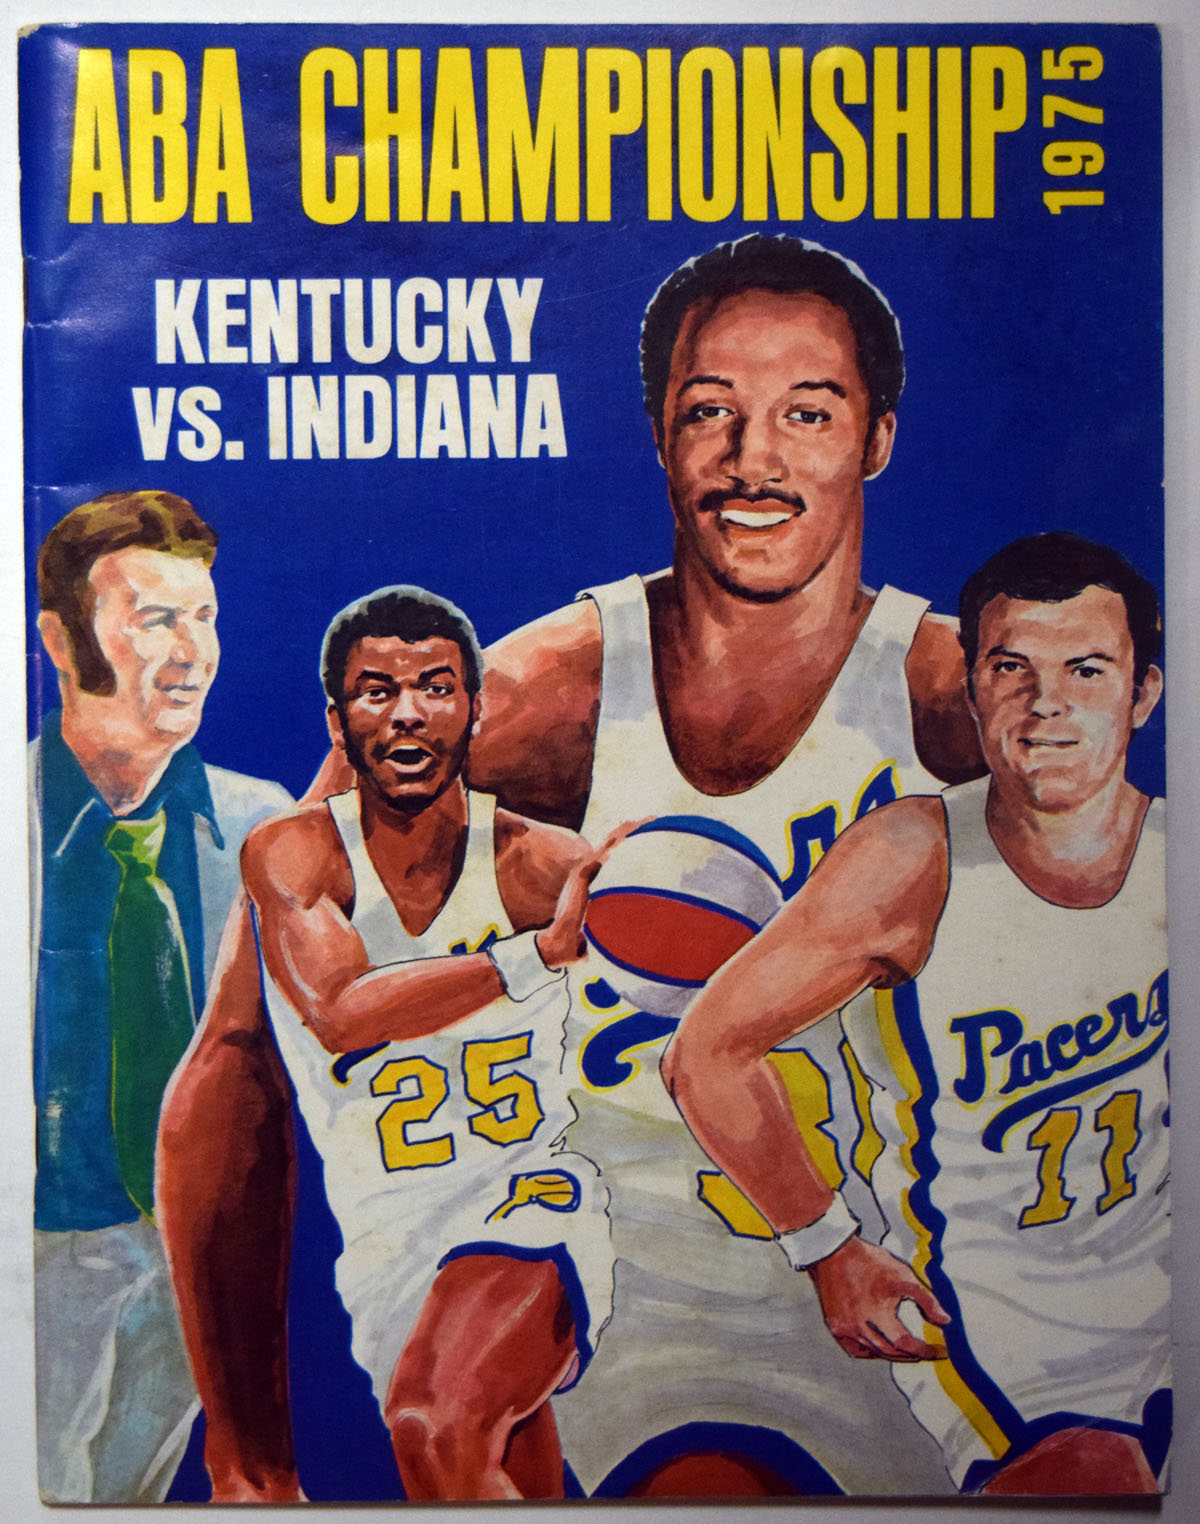 Lot #993 1975 Program  ABA Championship Program Cond: Ex-Mt